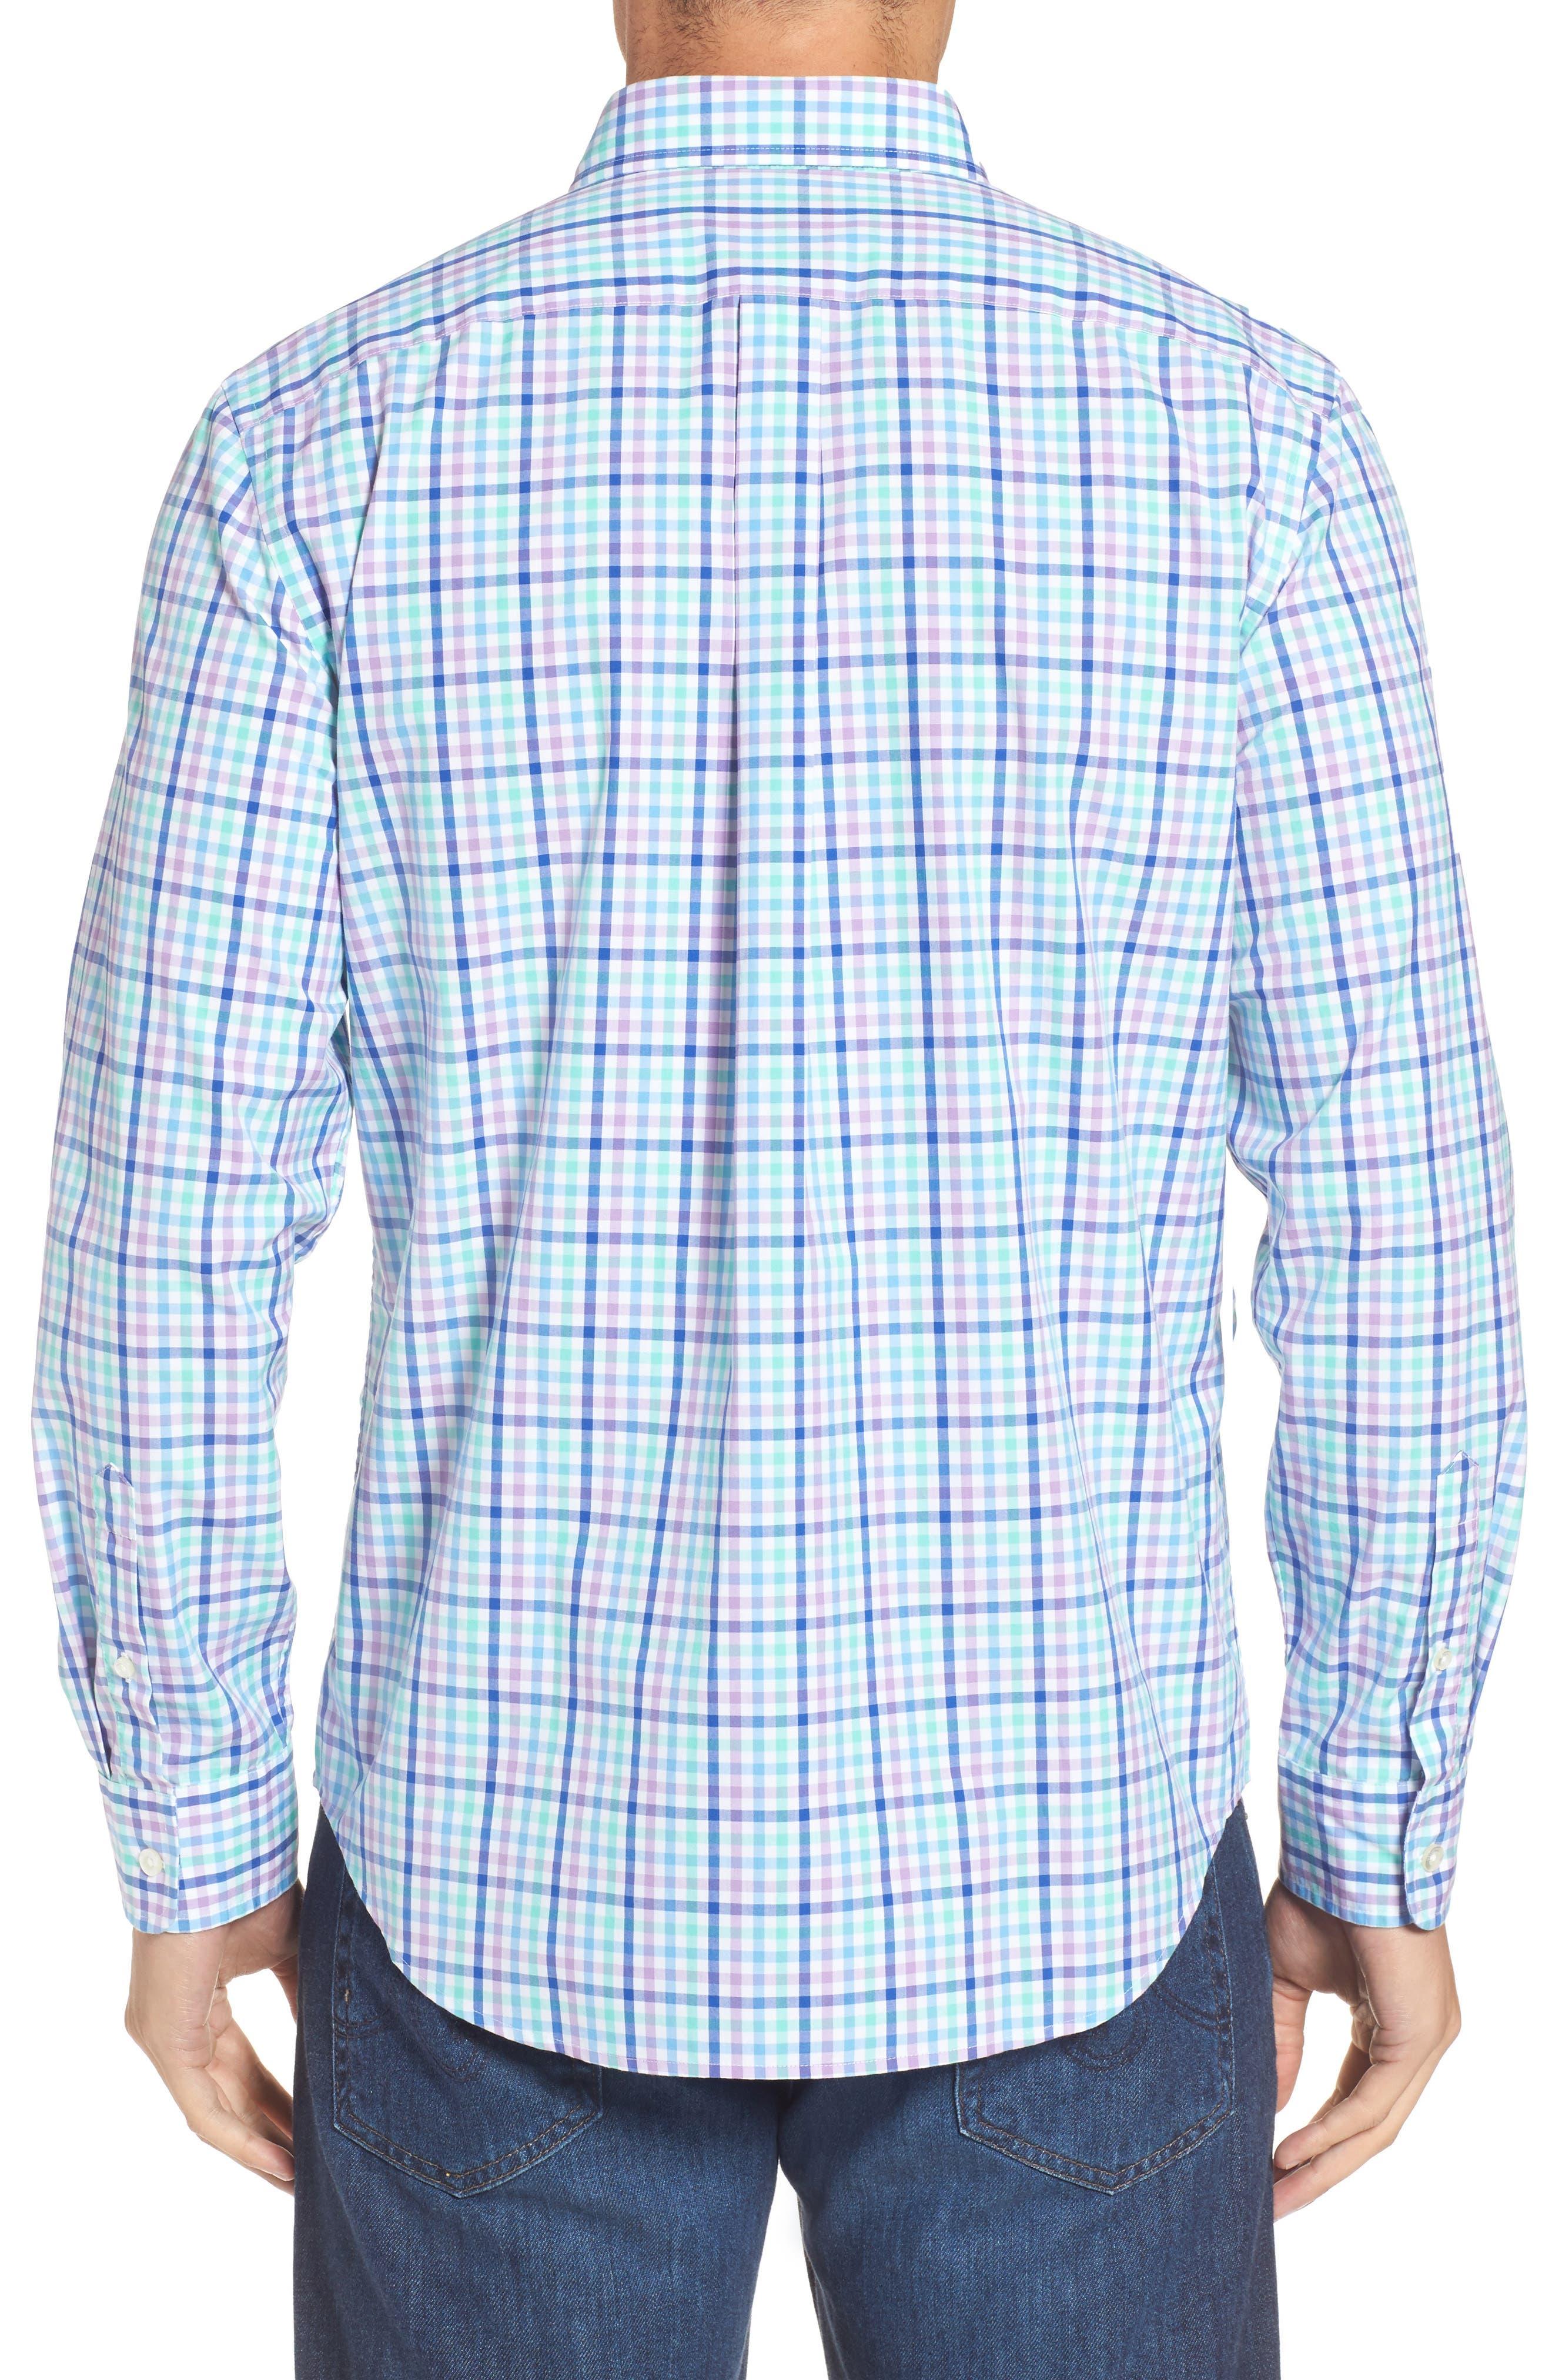 VINEYARD VINES,                             Tucker Gaspar Classic Fit Gingham Sport Shirt,                             Alternate thumbnail 2, color,                             359